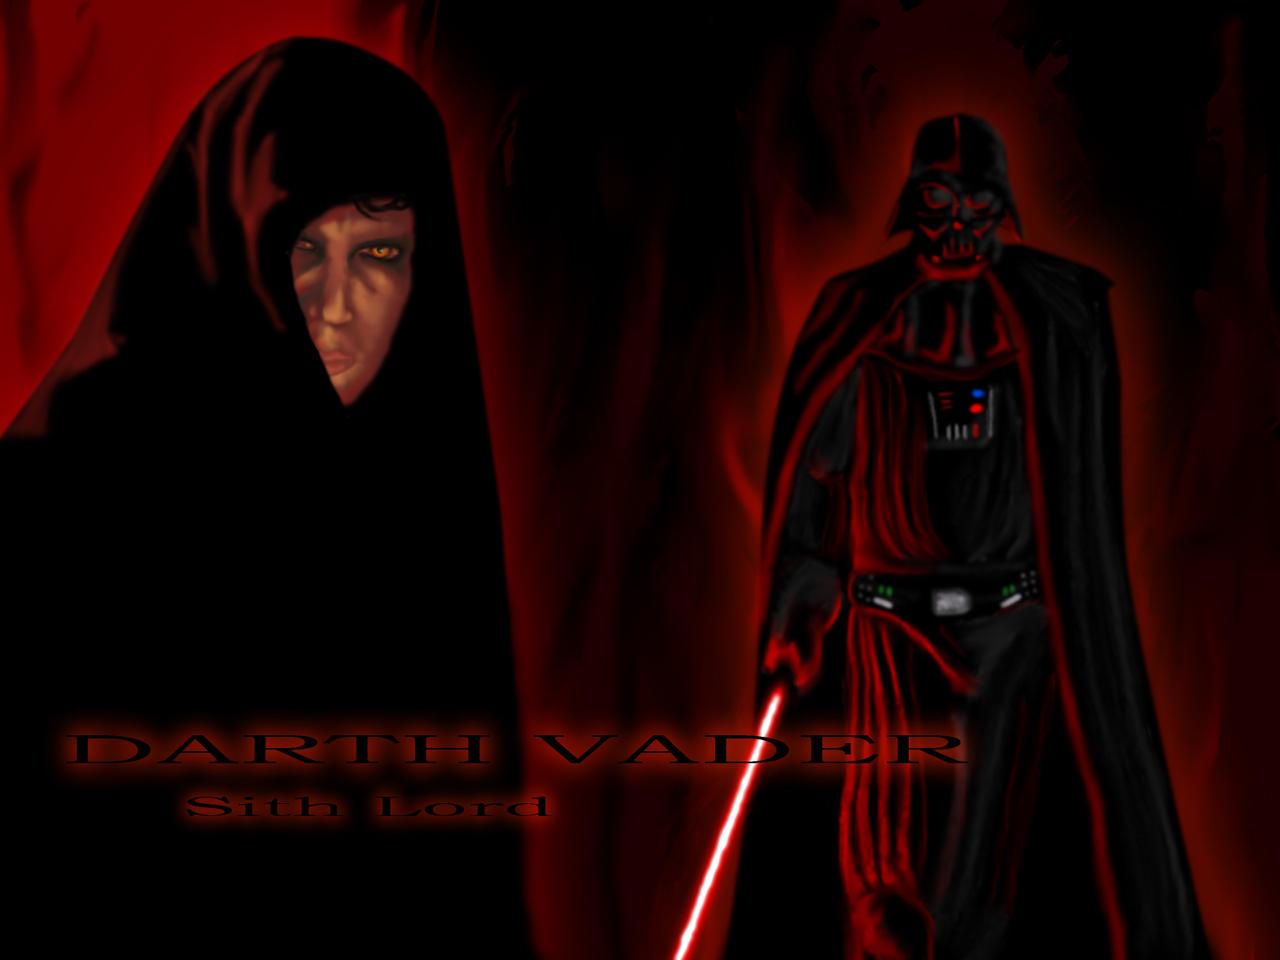 Darth Vader - Sith Lord by abovocipher on DeviantArt